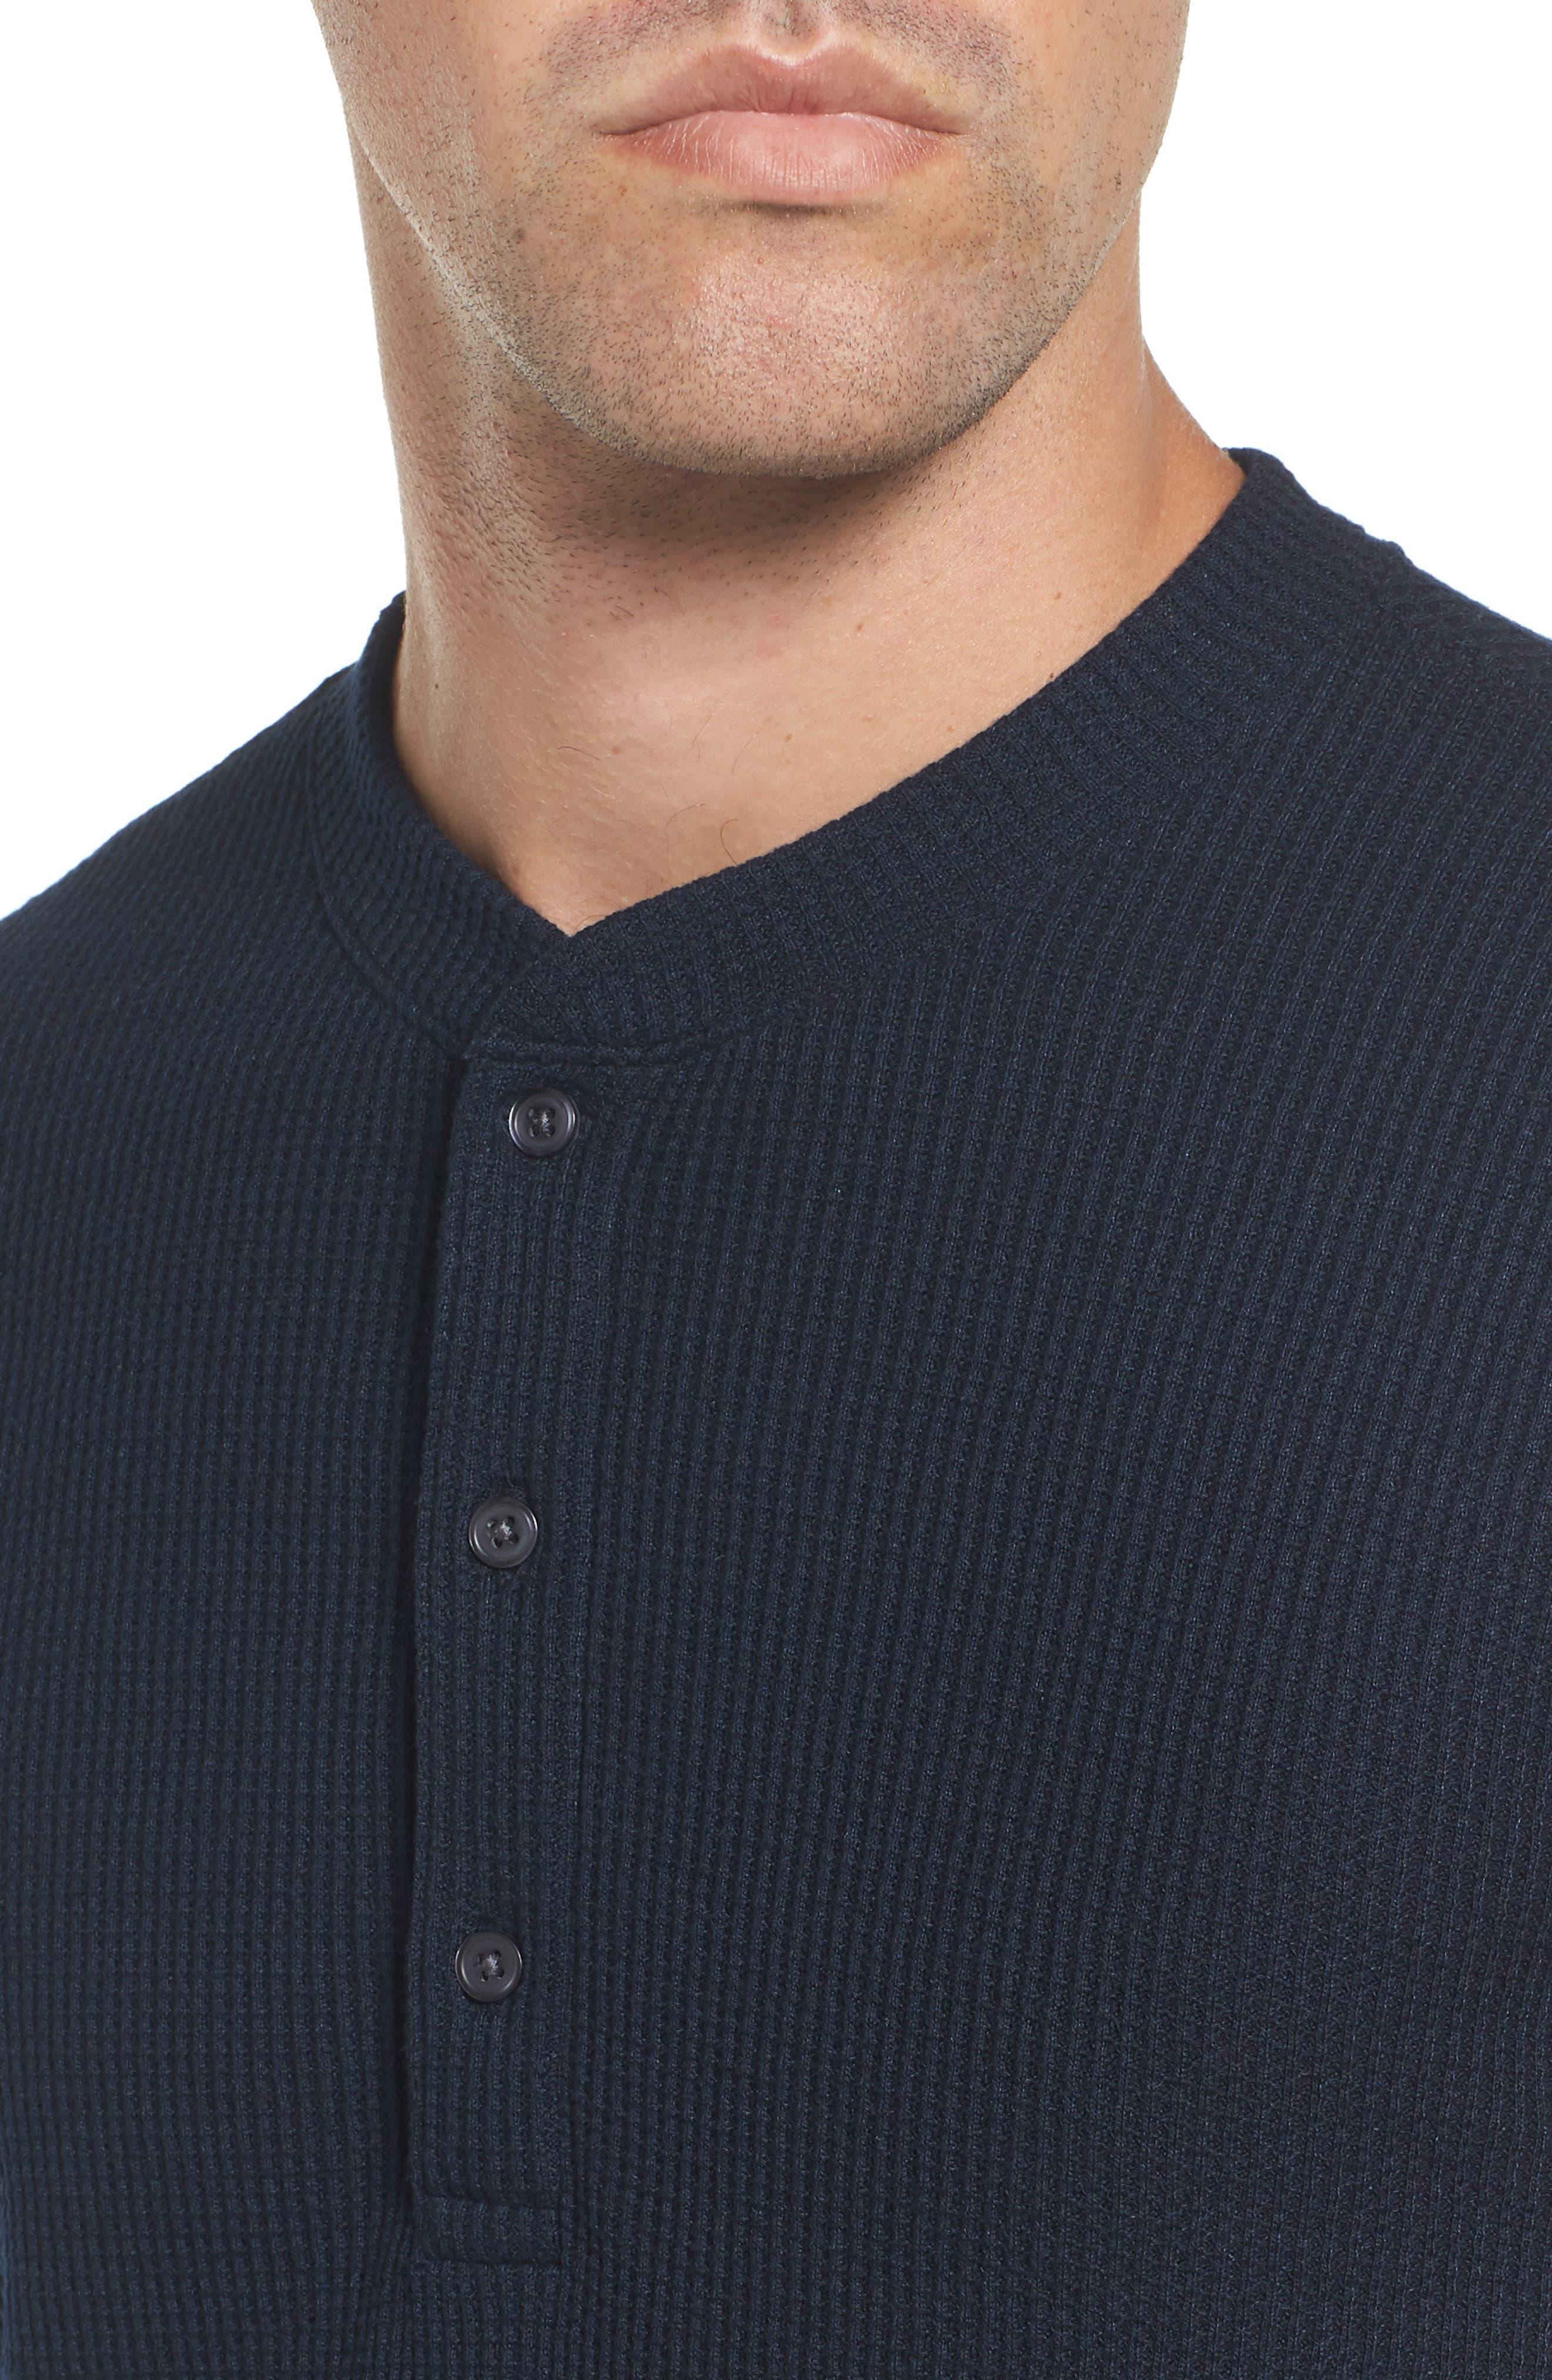 Slim Fit Long Sleeve Henley Shirt,                             Alternate thumbnail 11, color,